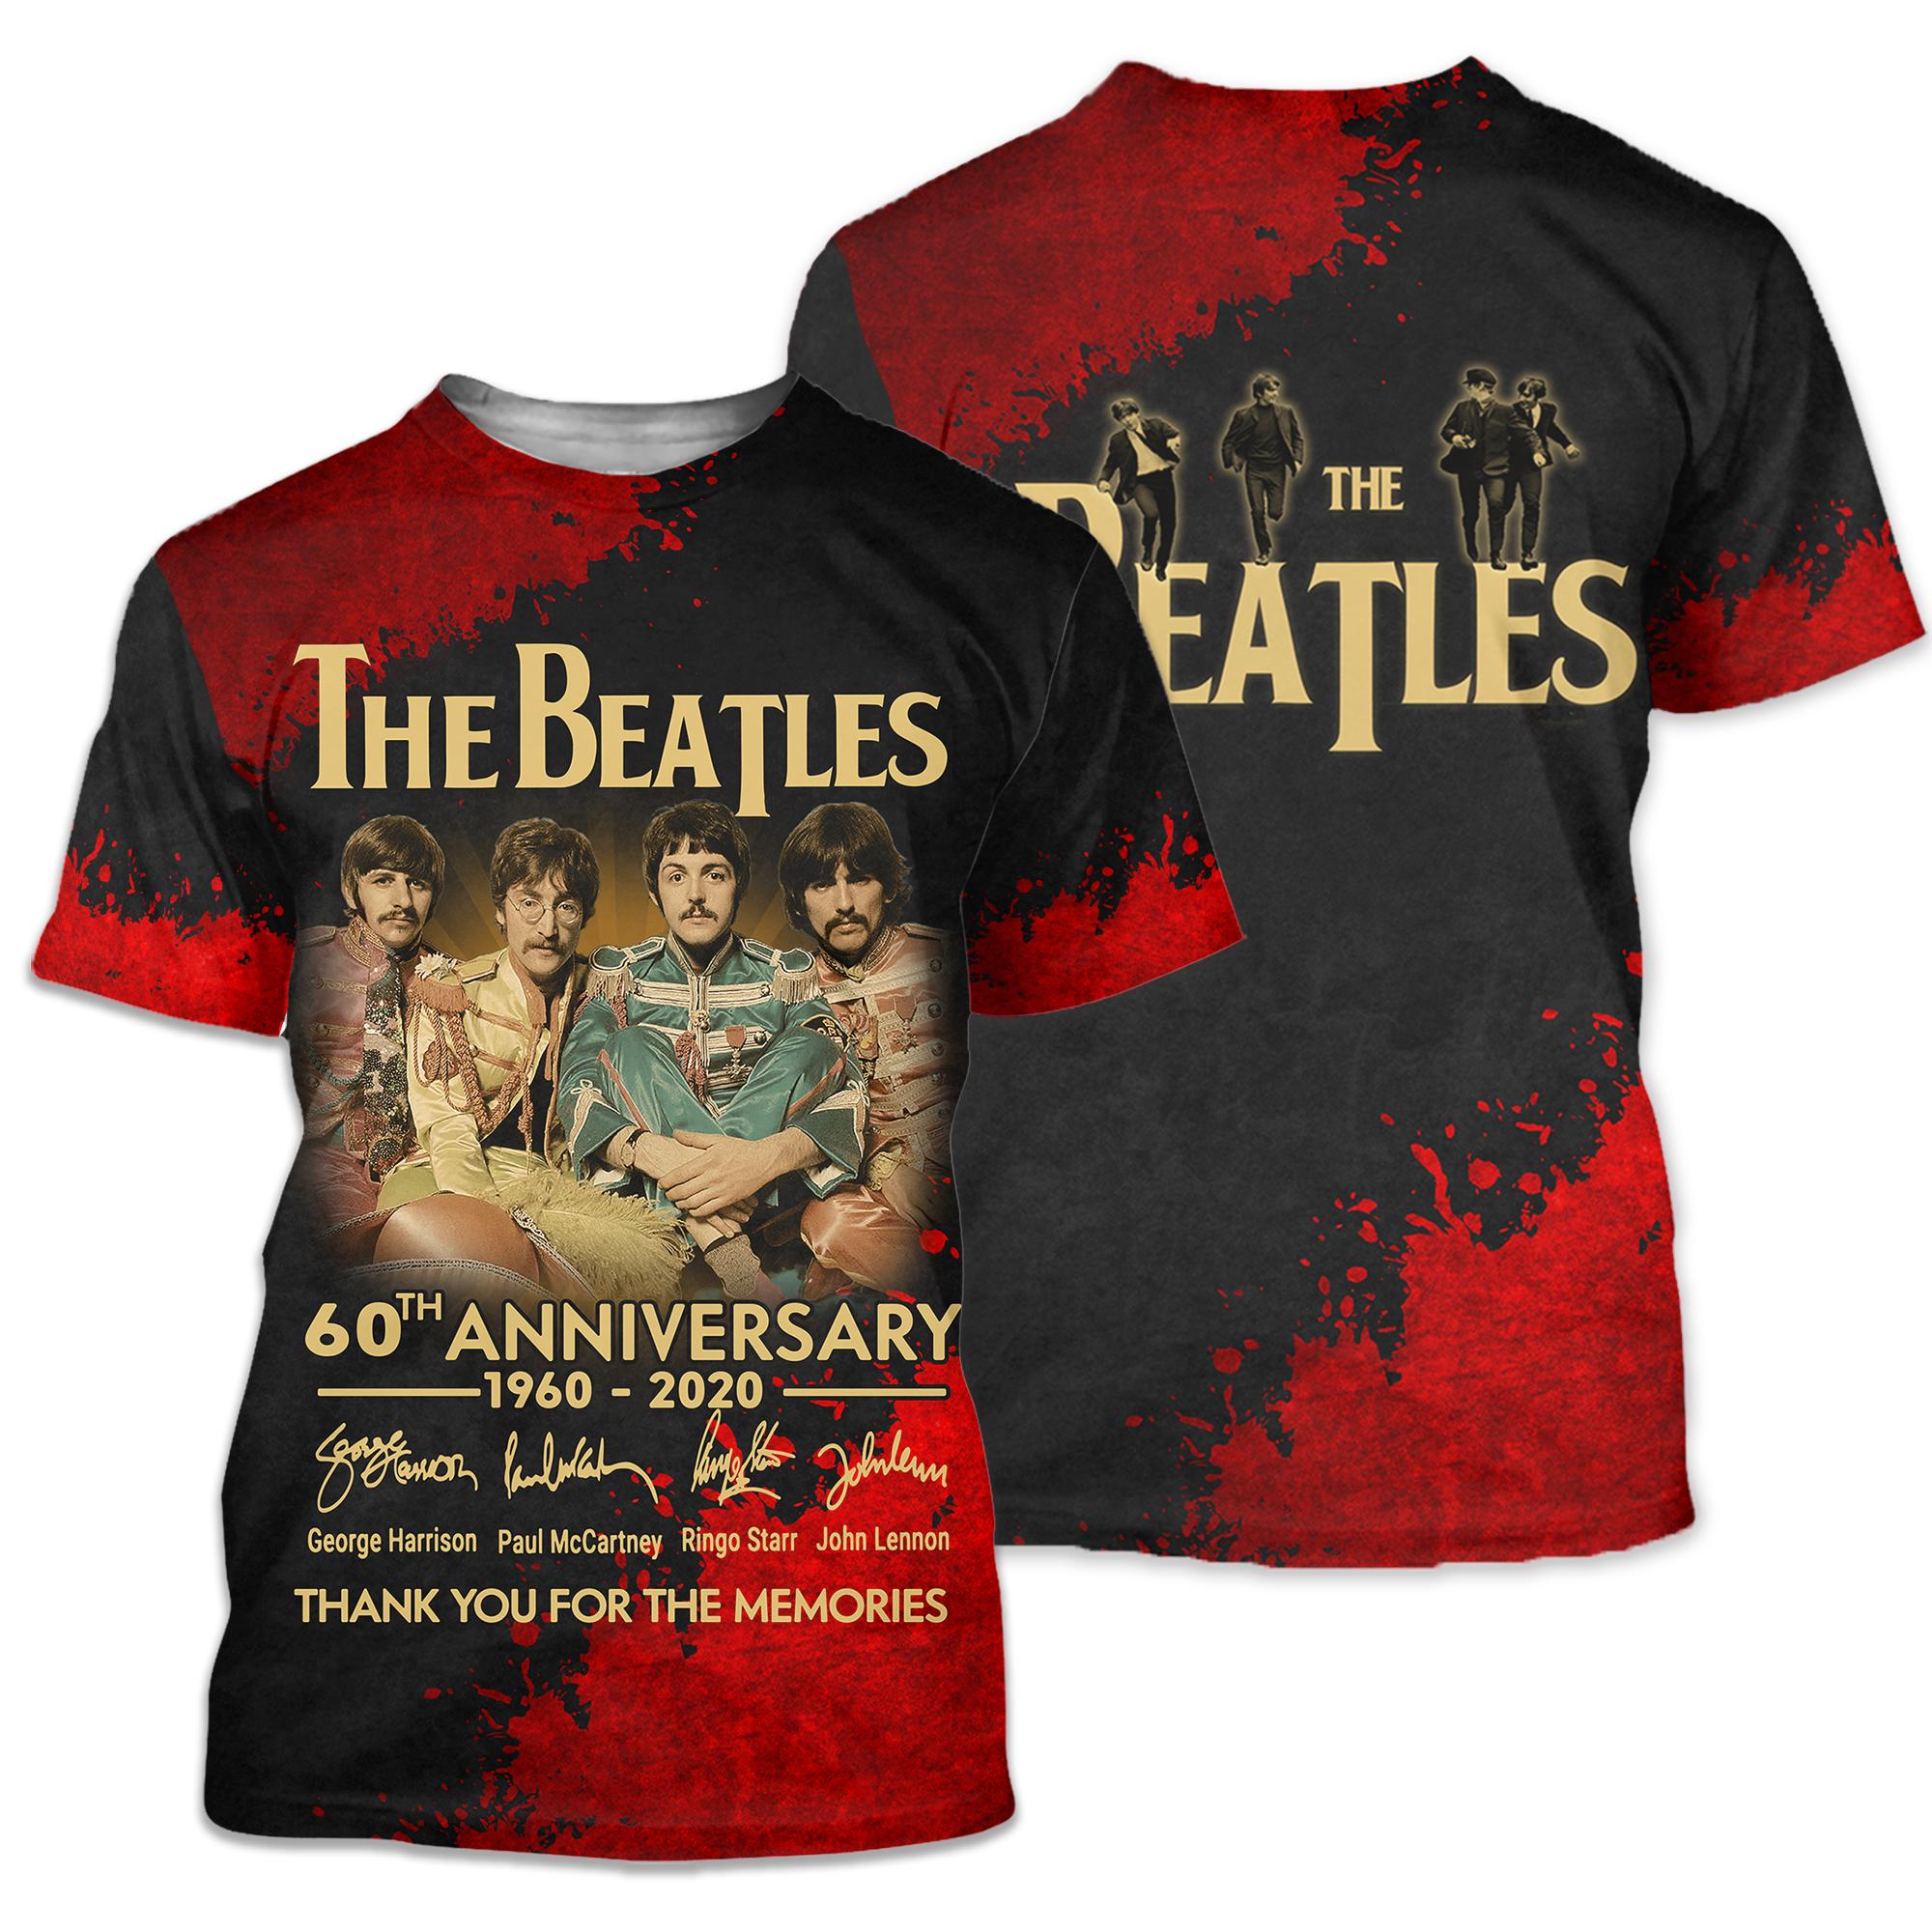 The beatles 60th anniversary 1960-2020 full printing tshirt